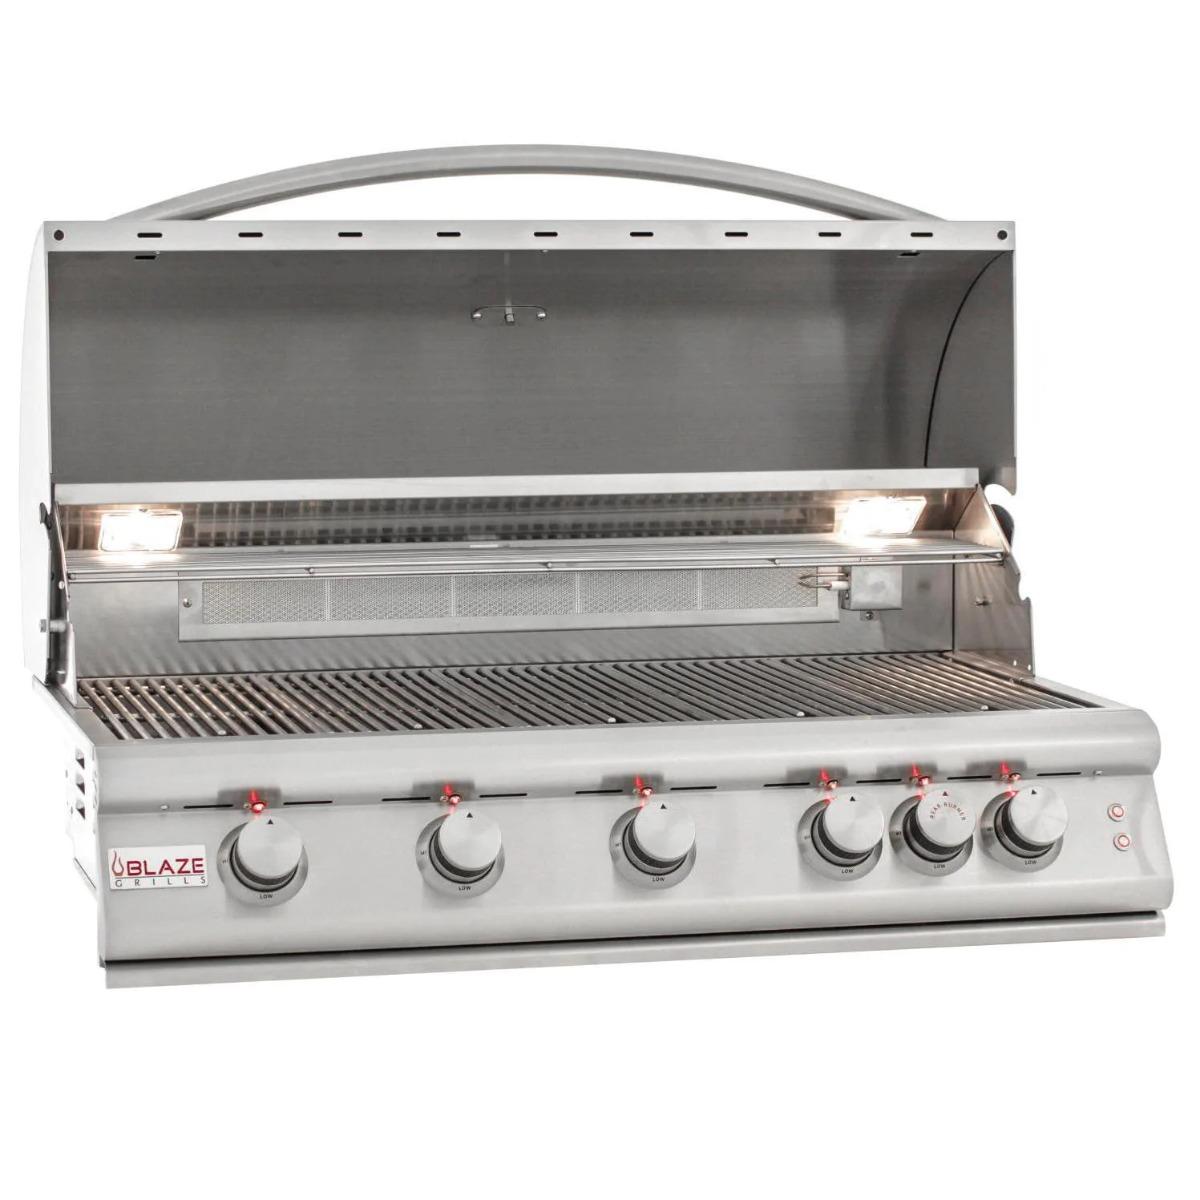 Blaze Premium LTE 40-Inch 5-Burner Built-In Propane Grill With Rear Infrared Burner & Grill Lights - blz-5lte2-lp